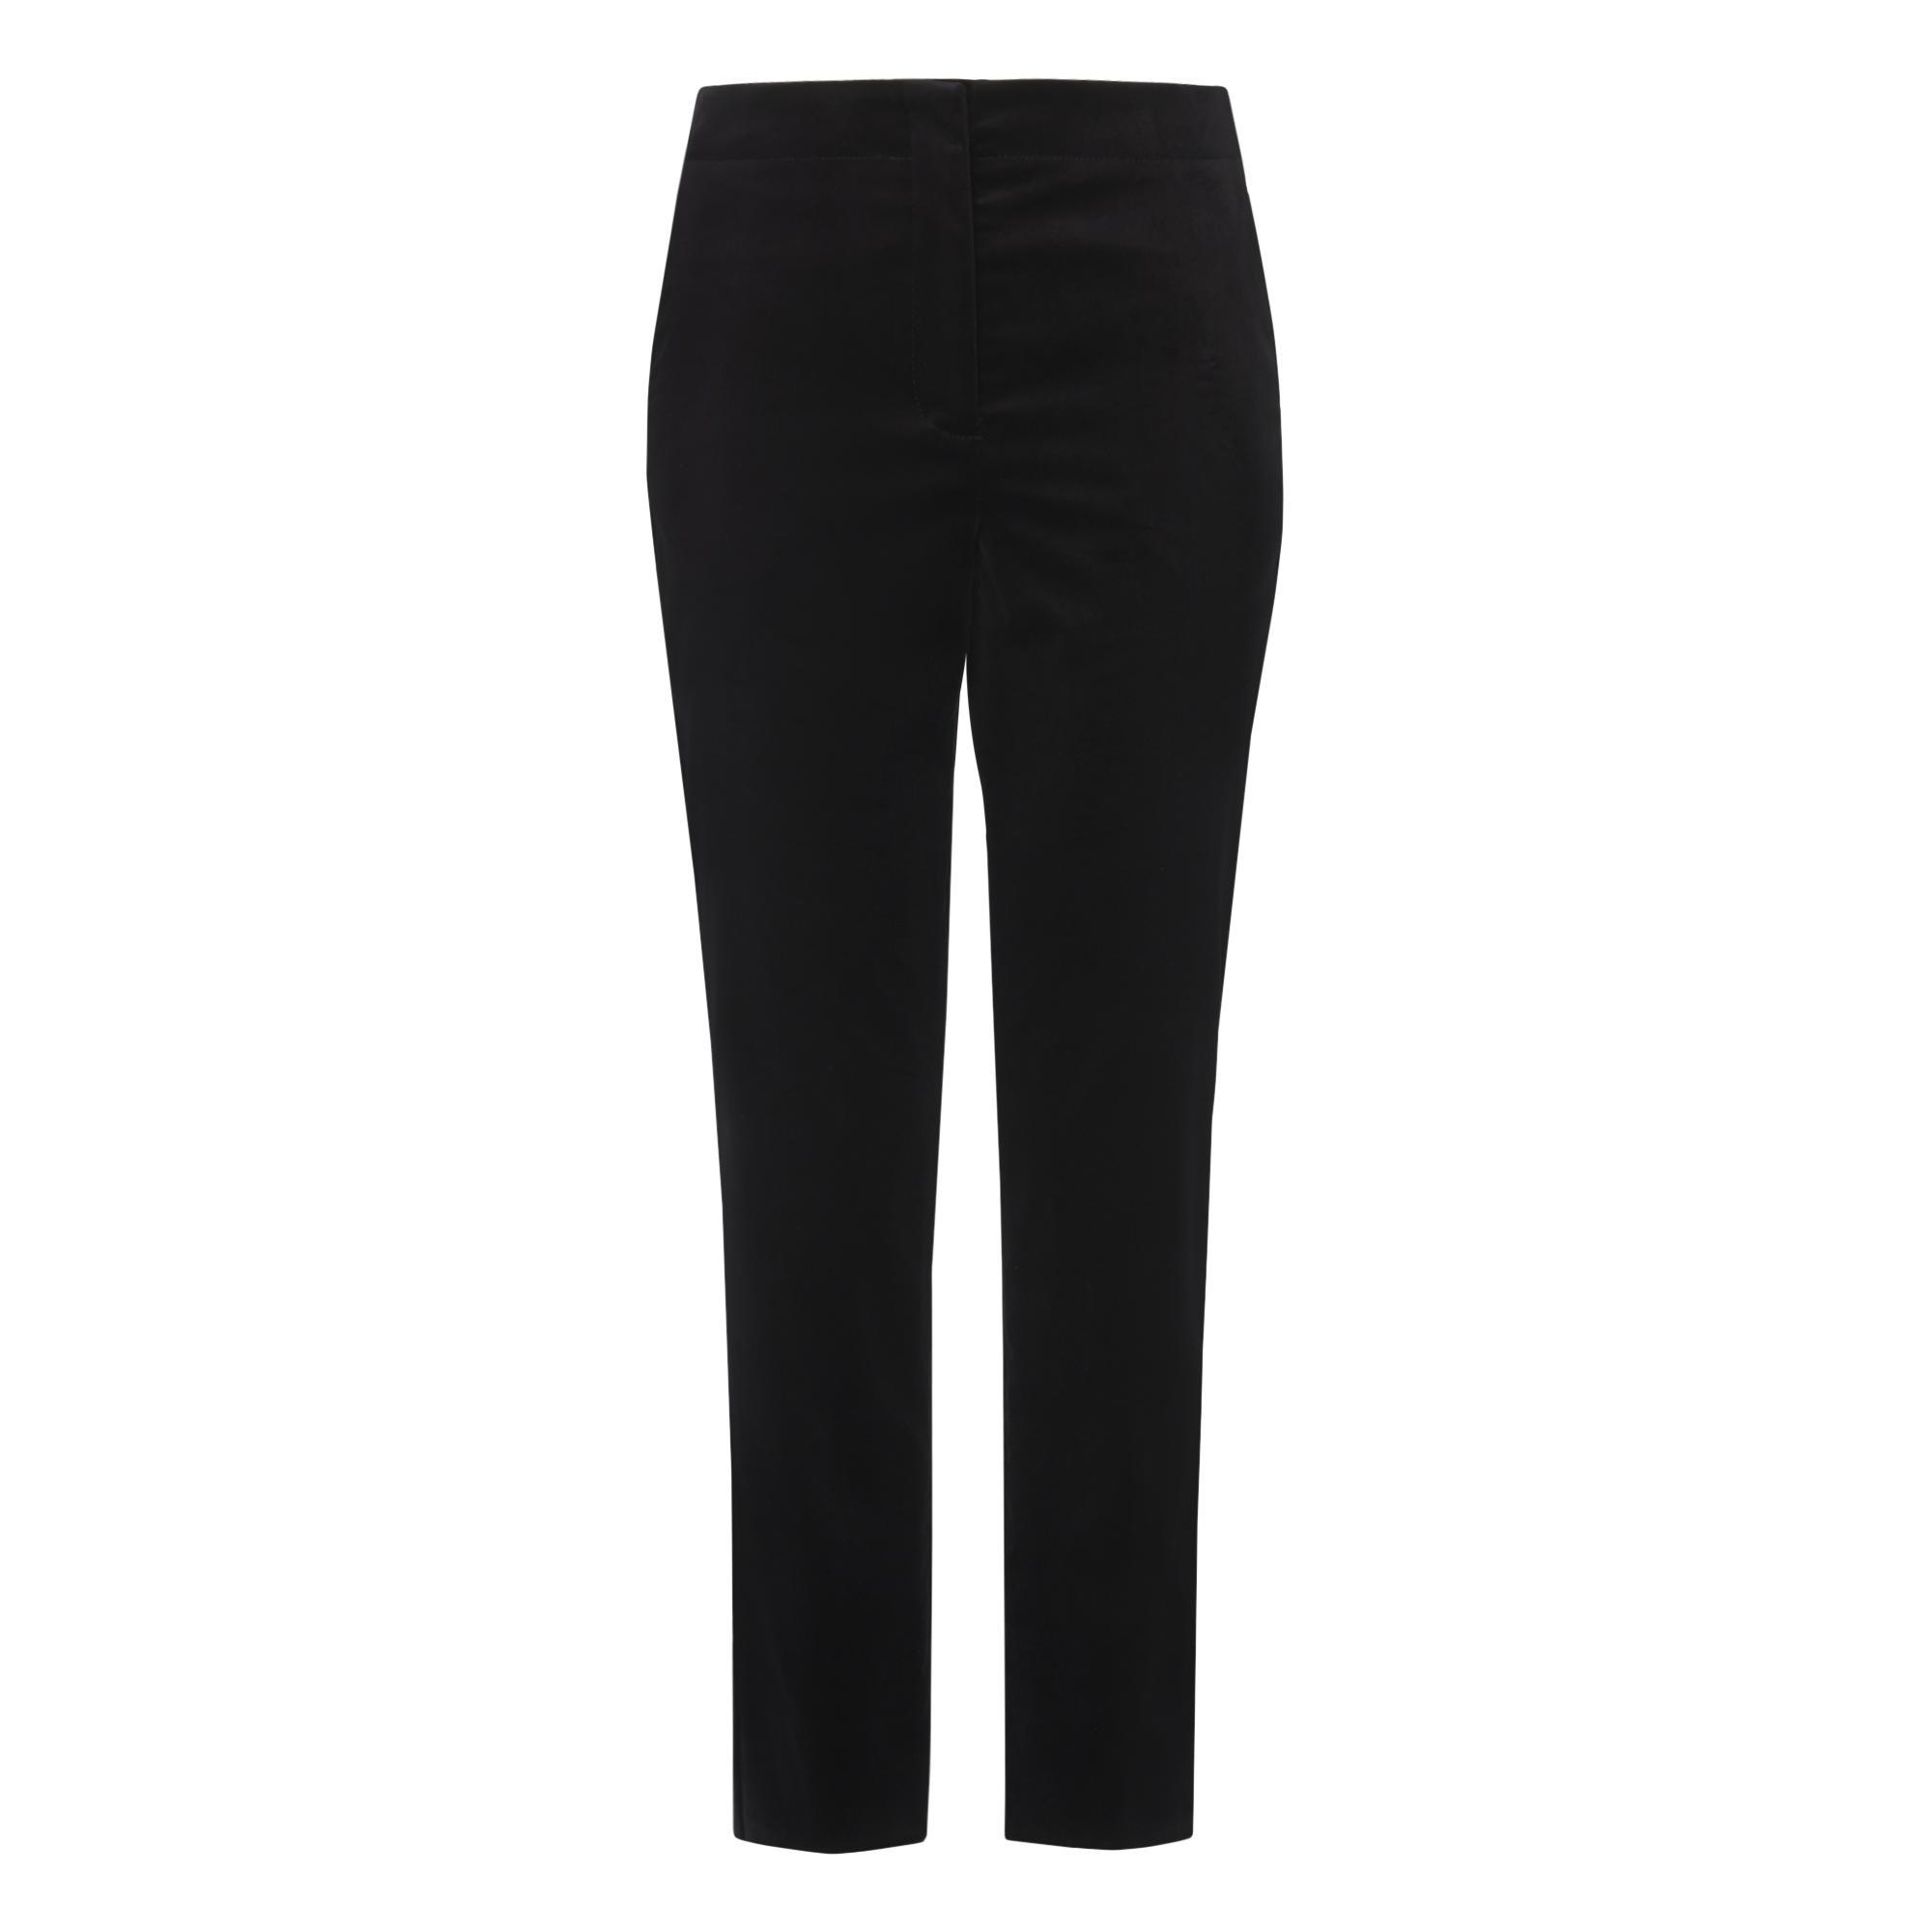 Lilly Black Velvet Cropped Trousers